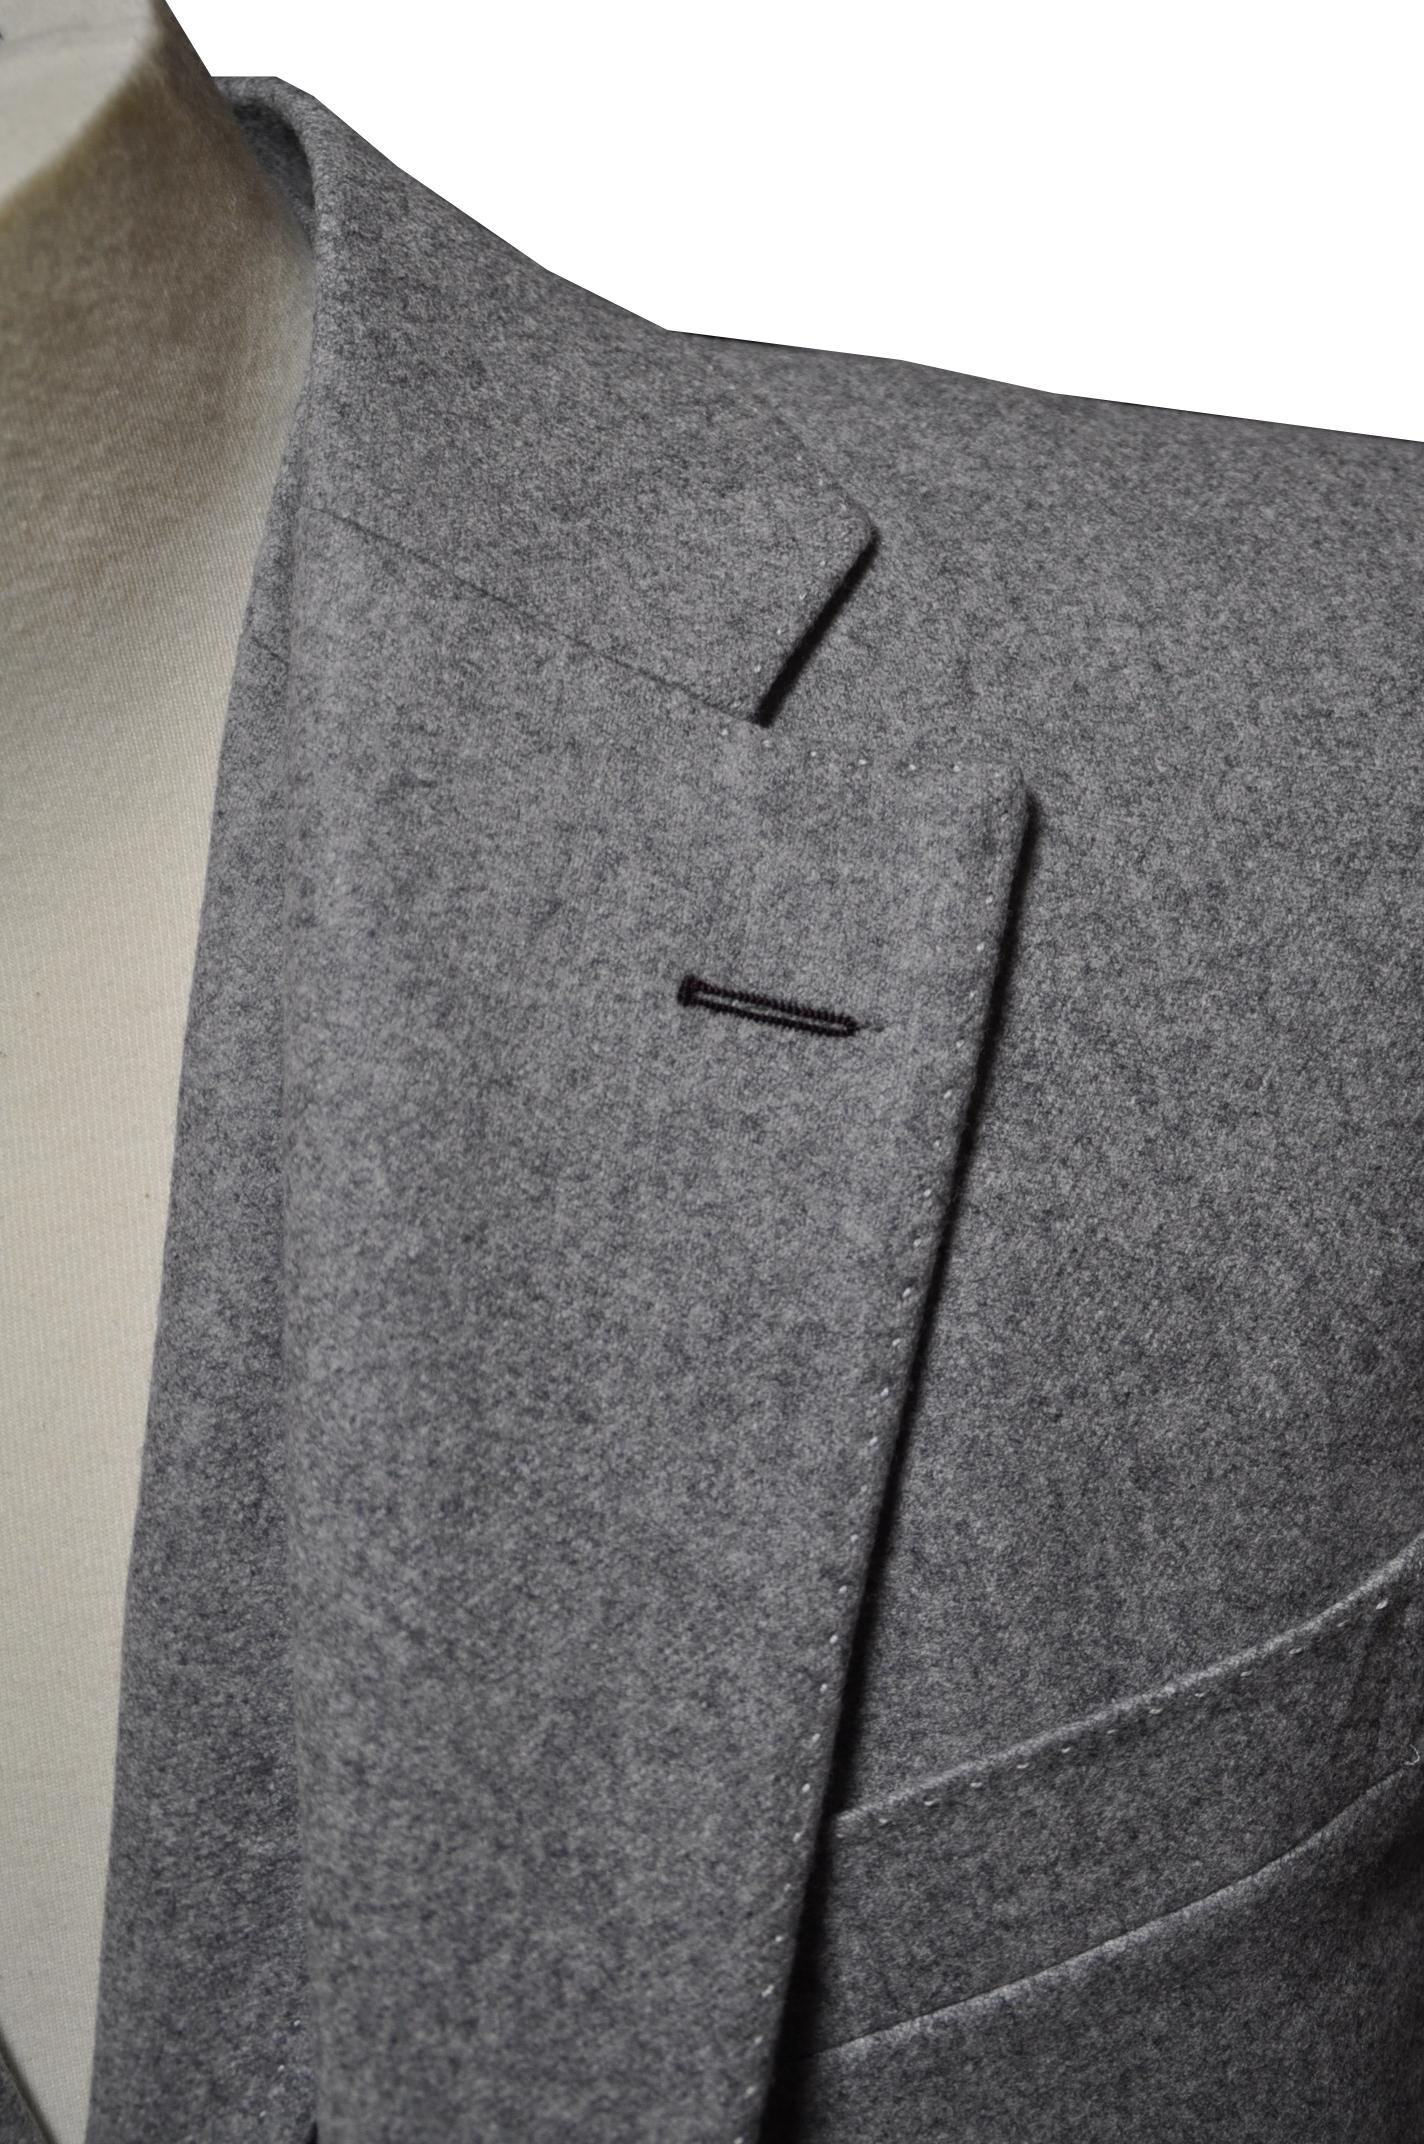 okd81 ボタンホール糸色変更 名古屋の完全予約制オーダースーツ専門店DEFFERT